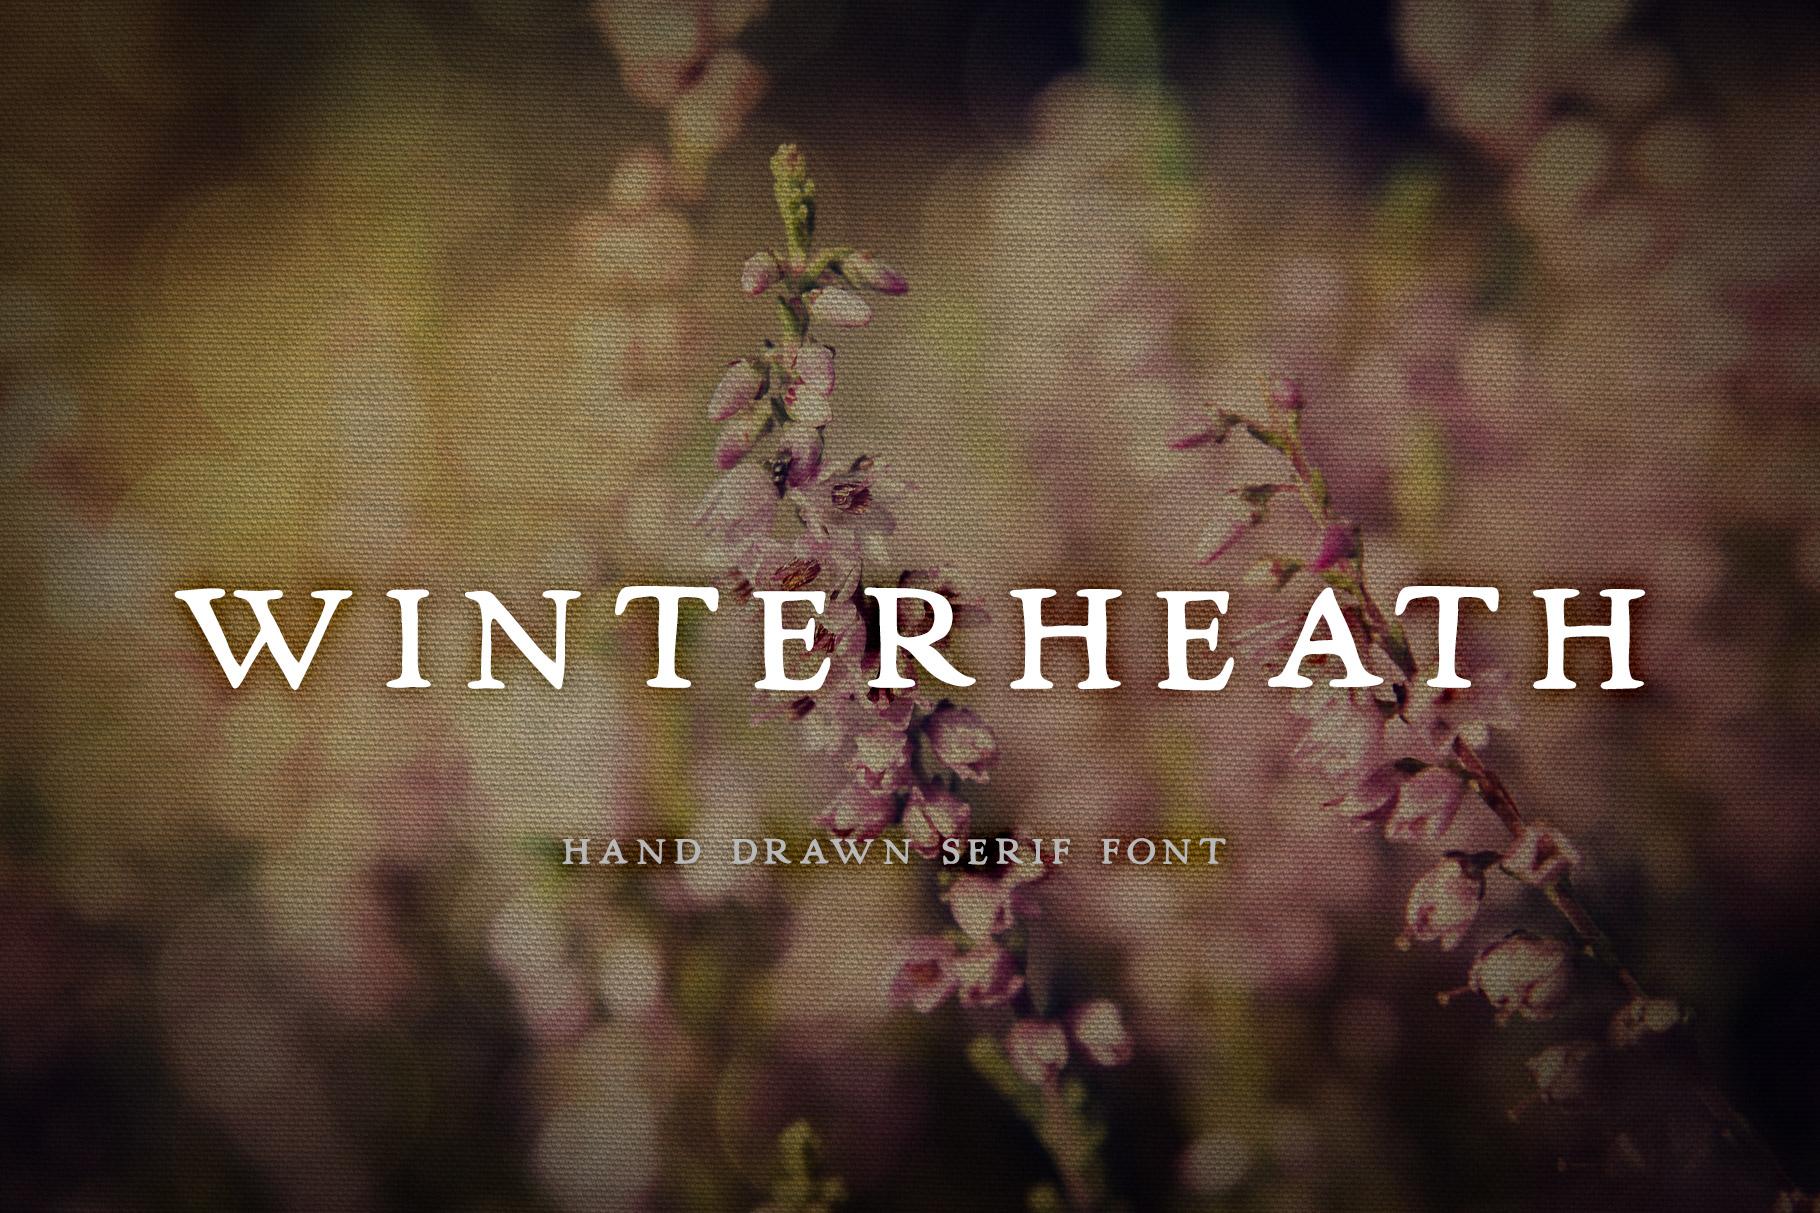 Winterheath Hand Drawn Serif Font example image 1